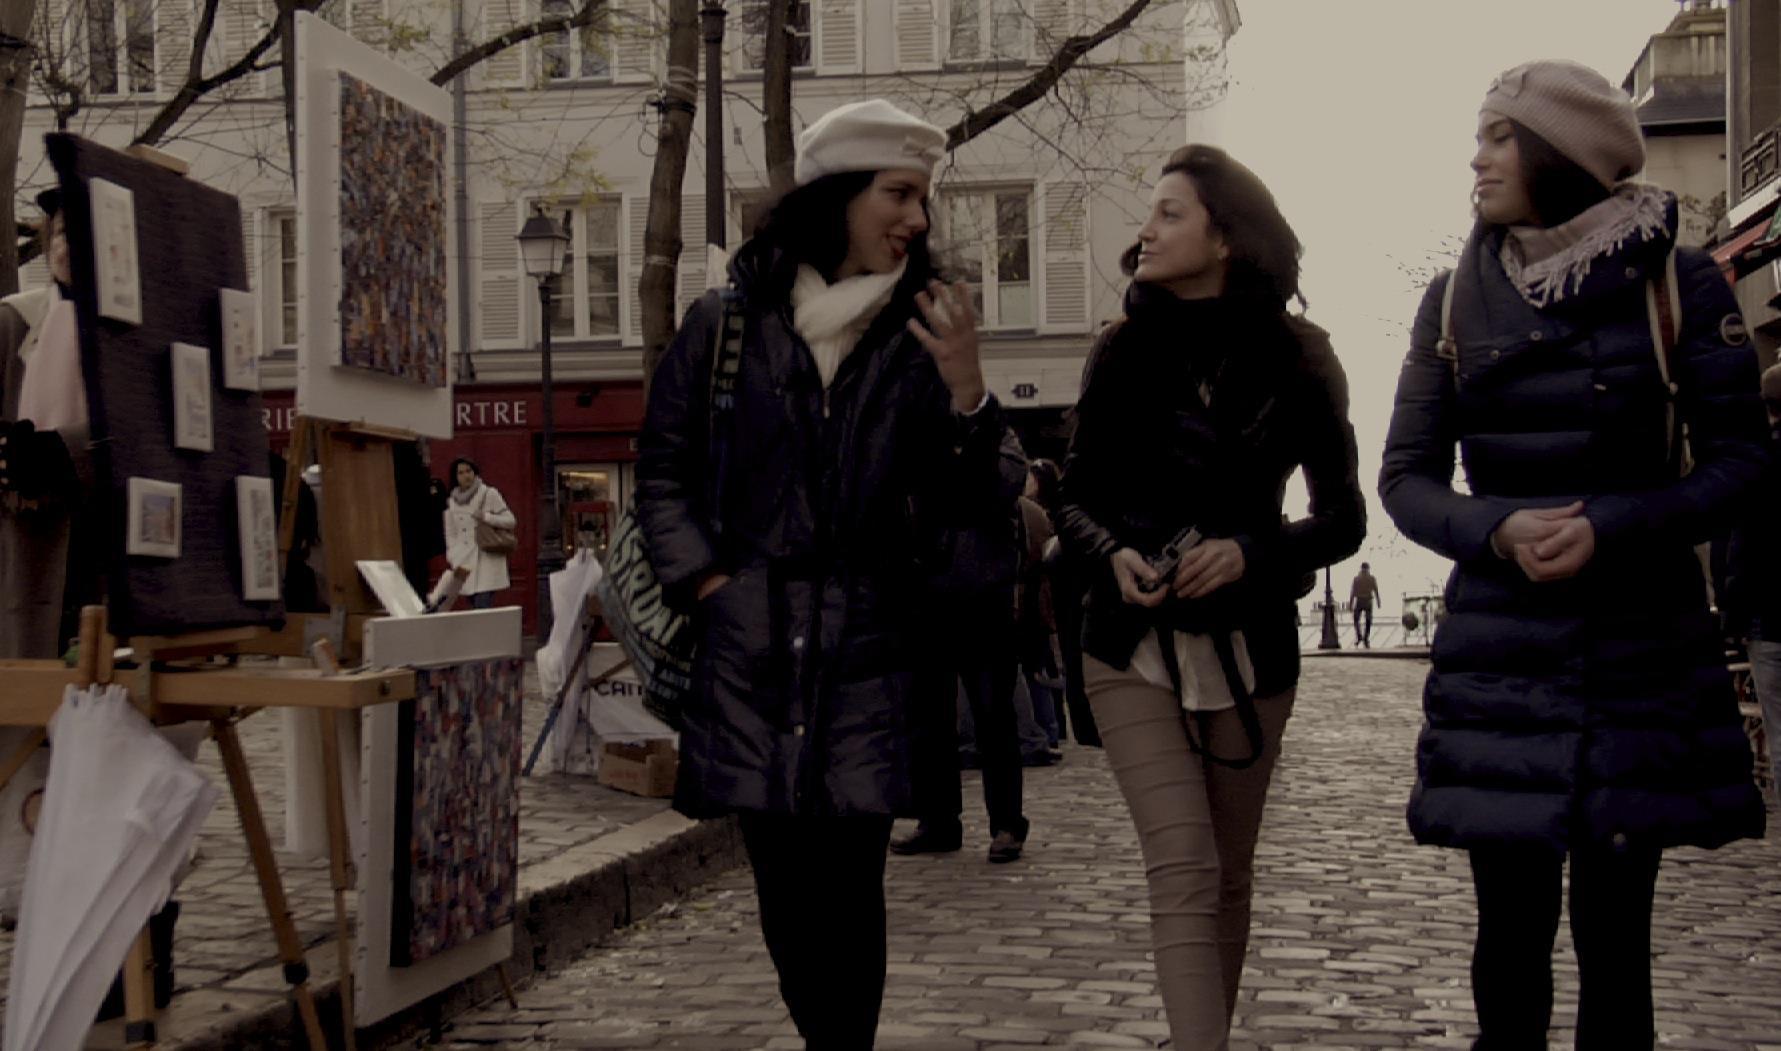 eurotrip storie di piceni che vivono a parigi